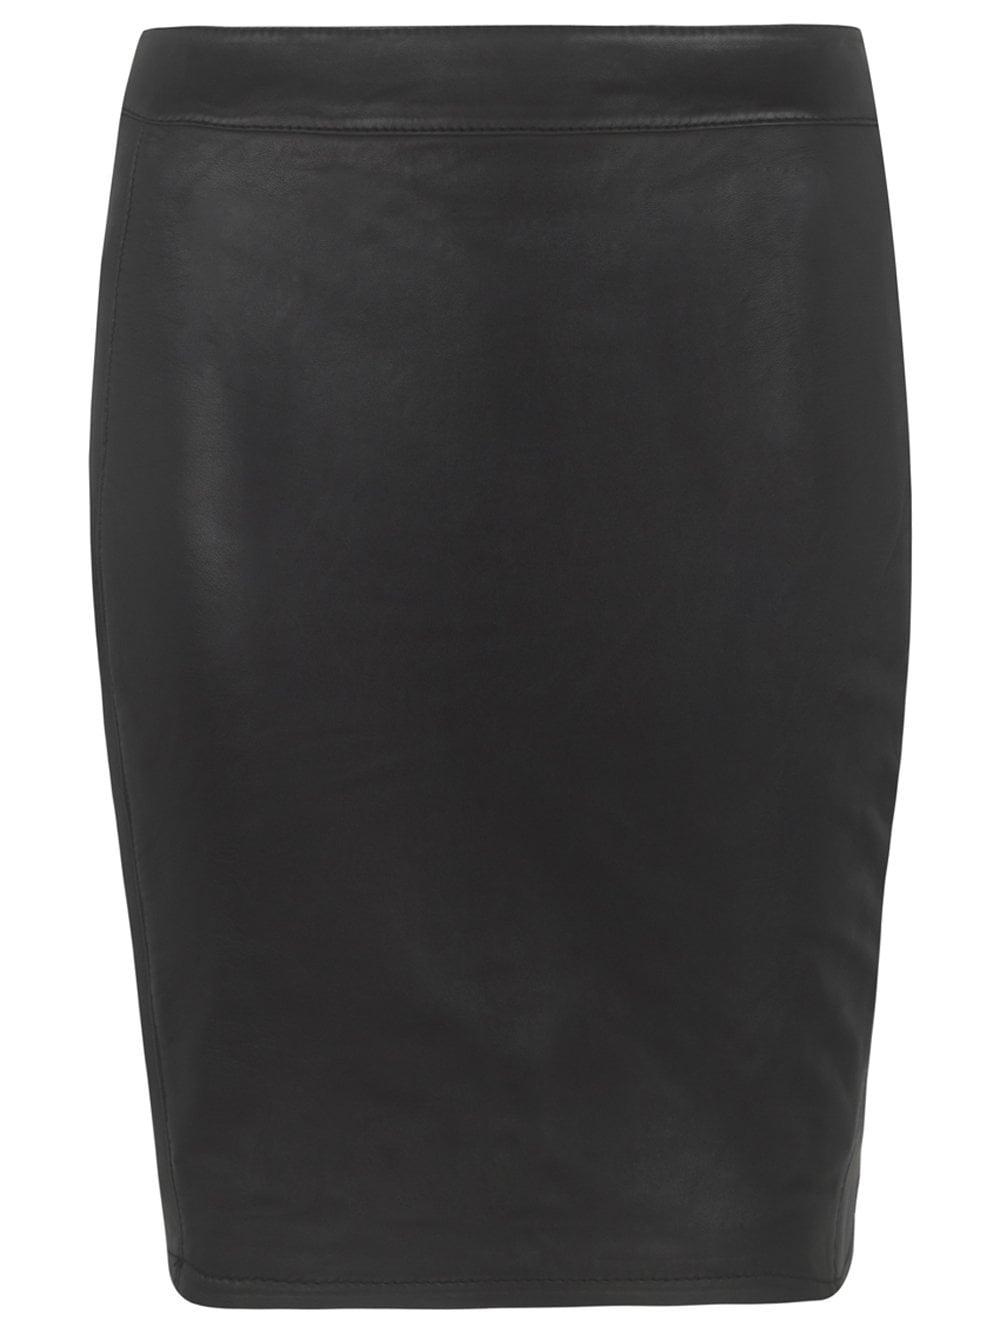 4a4a02209 Muubaa Persei Leather Skirt in Black